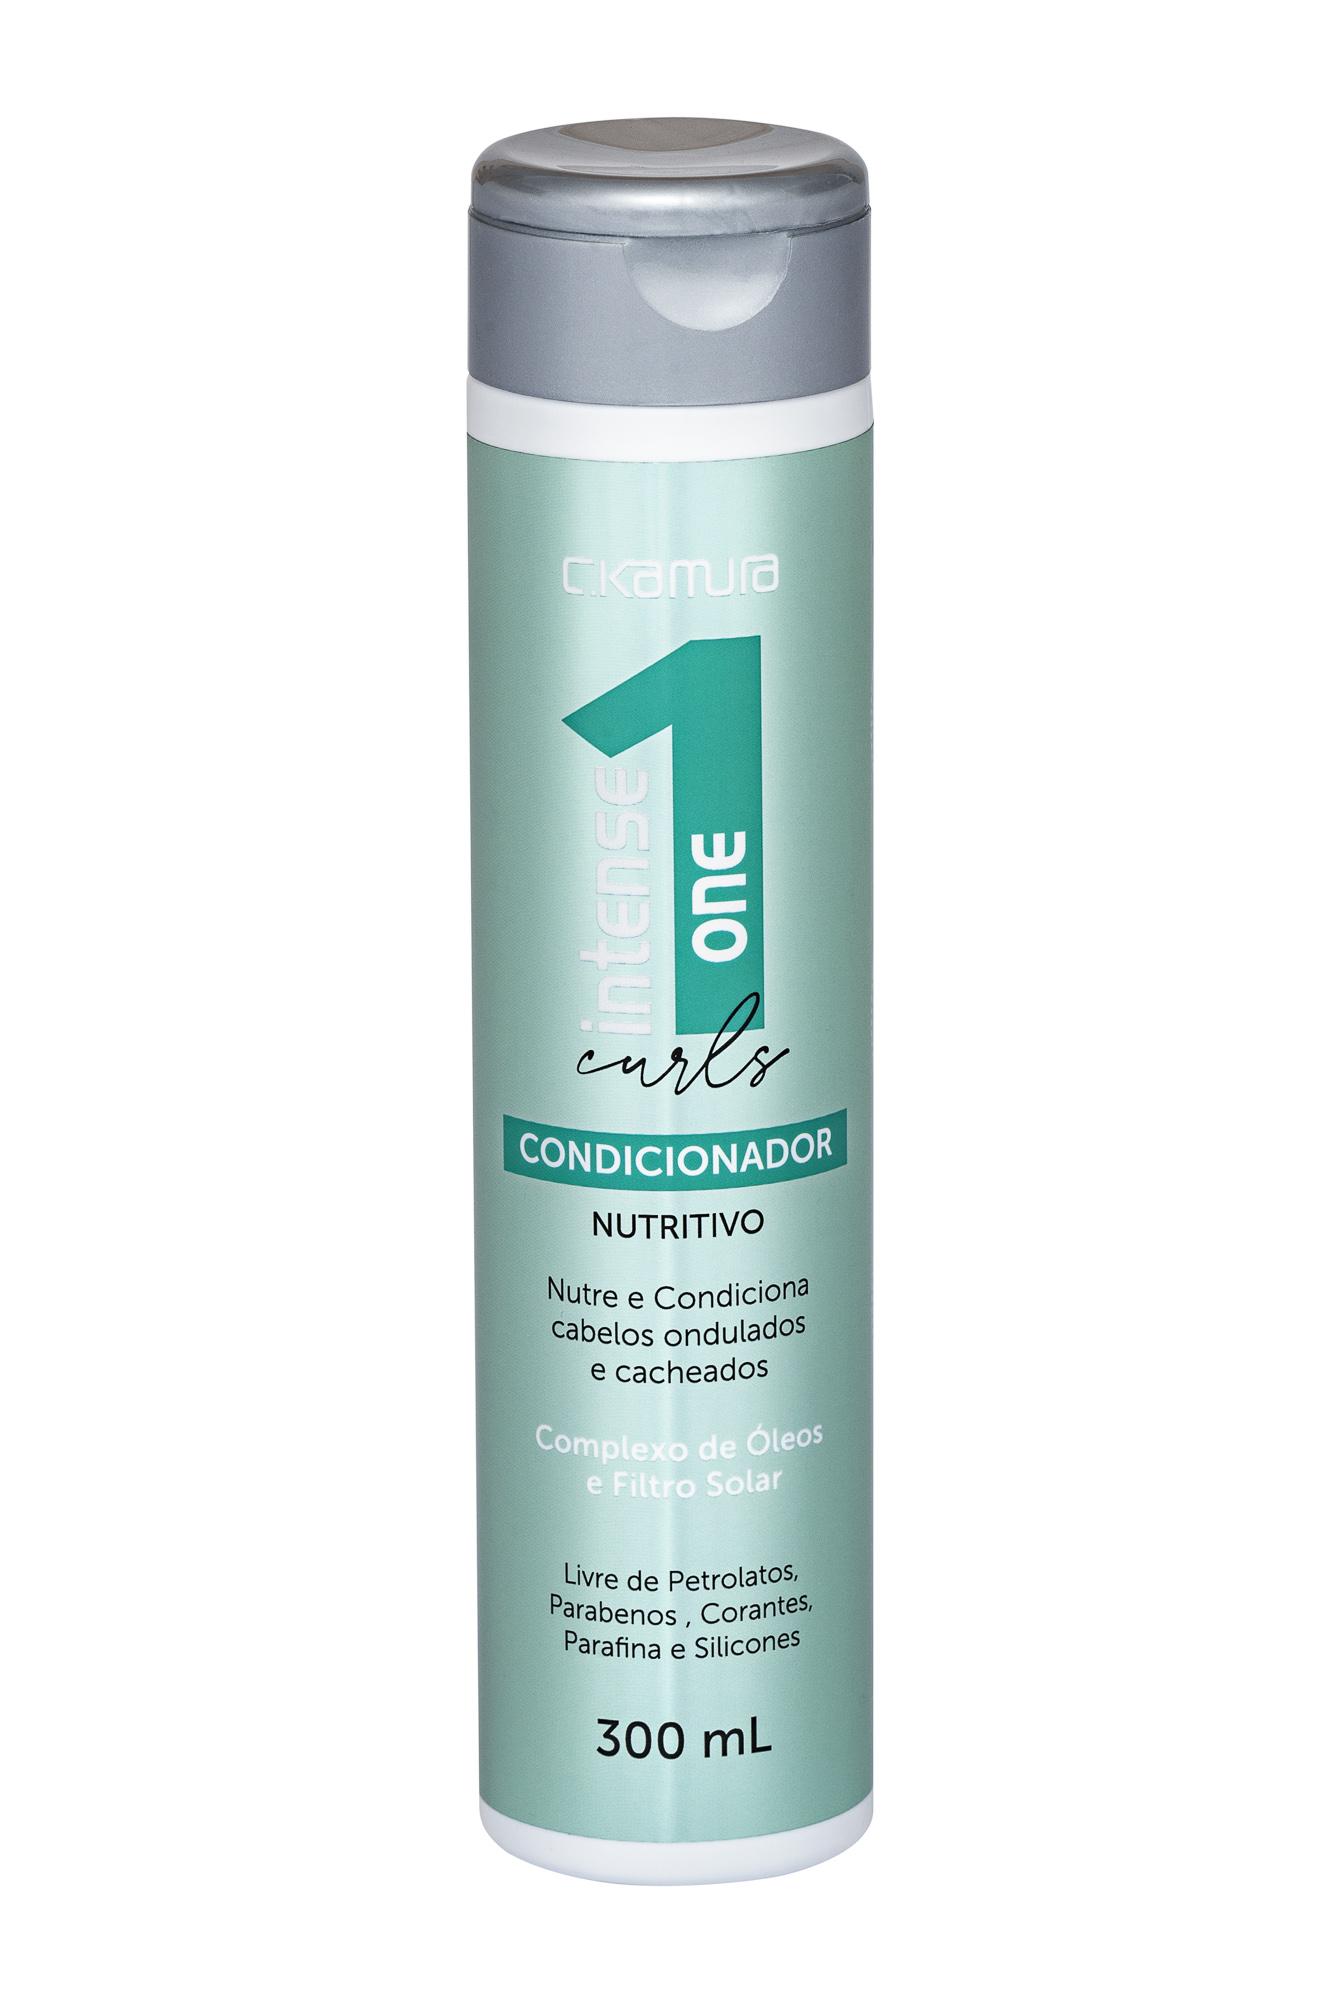 Condicionador Intense One Curls CKamura 300ml